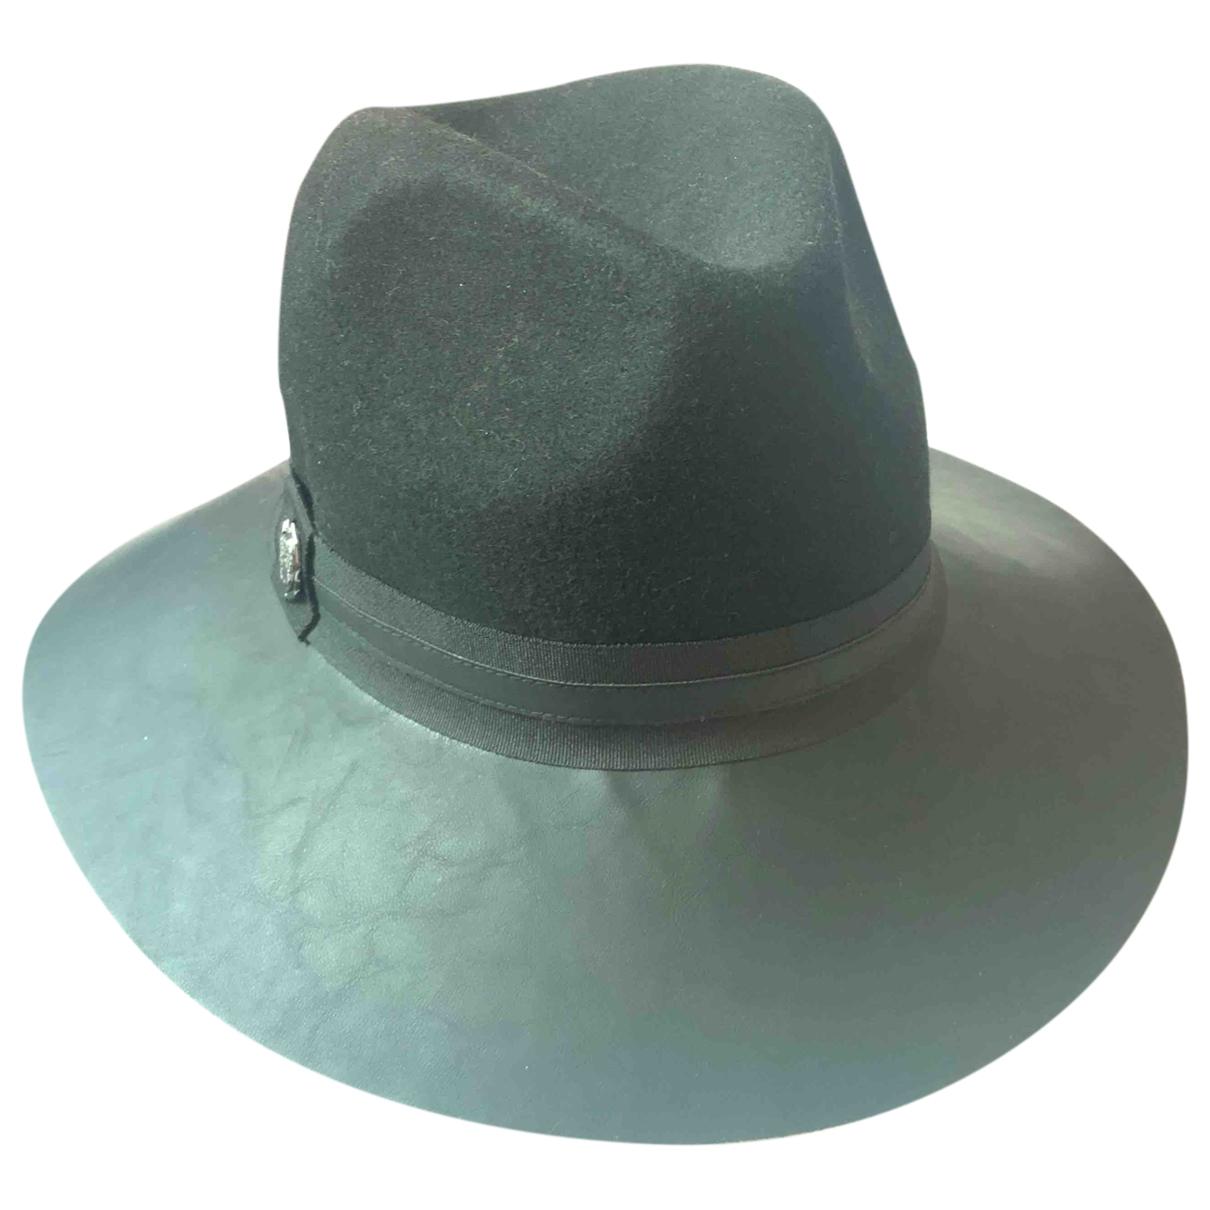 Vince Camuto \N Black Wool hat for Women S International